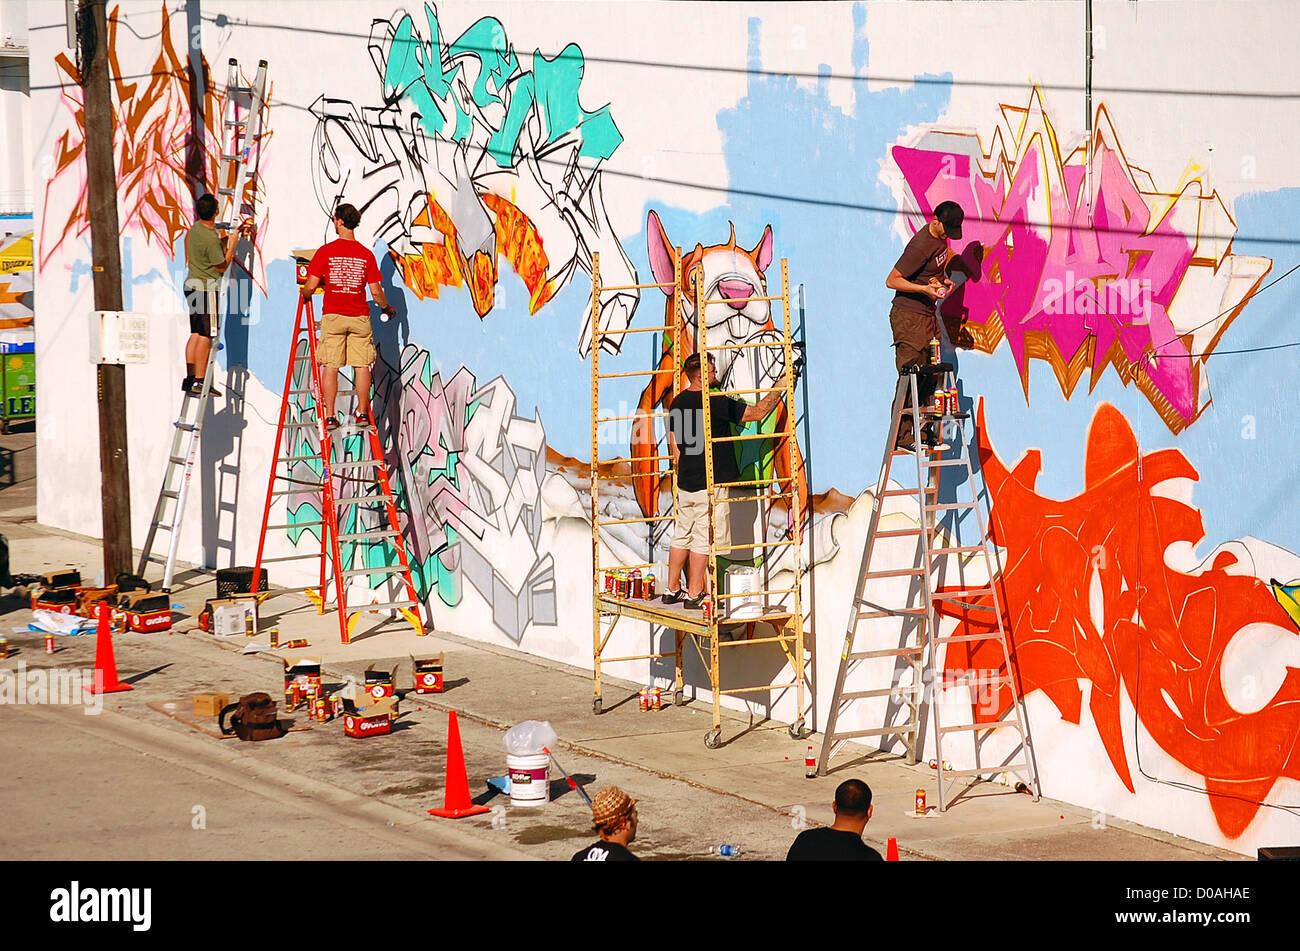 Welt Berühmten Graffiti Künstler Beteiligen Scion Trilogie Gebäude